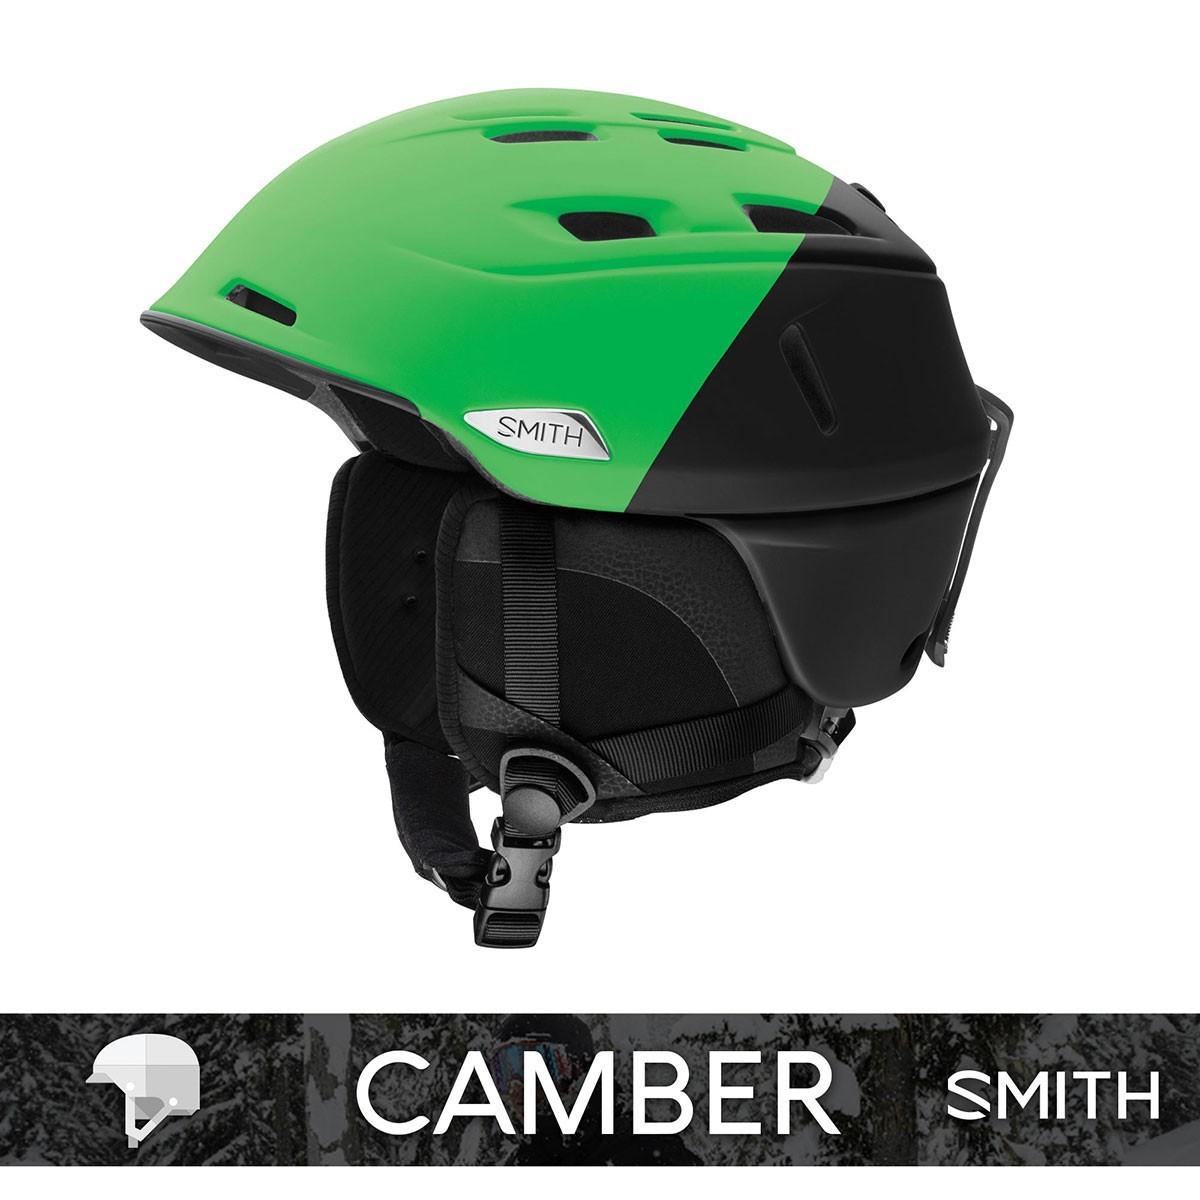 SMITH CAMBER matte Reactor Black - Изображение - AQUAMATRIX